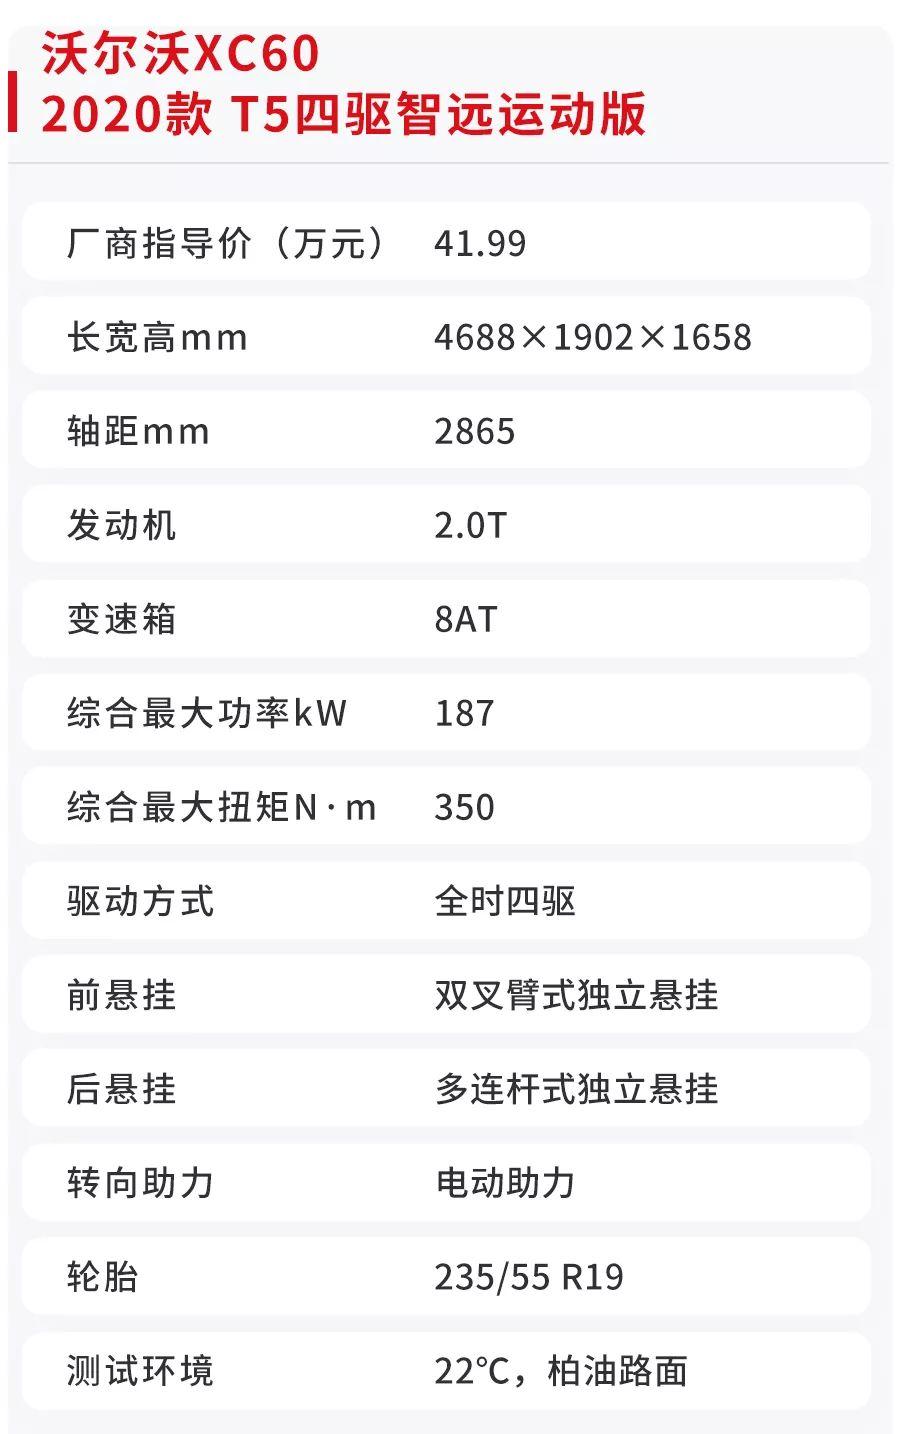 2.0T+8AT,百公里加速8秒内,这款SUV究竟值不值得入手?